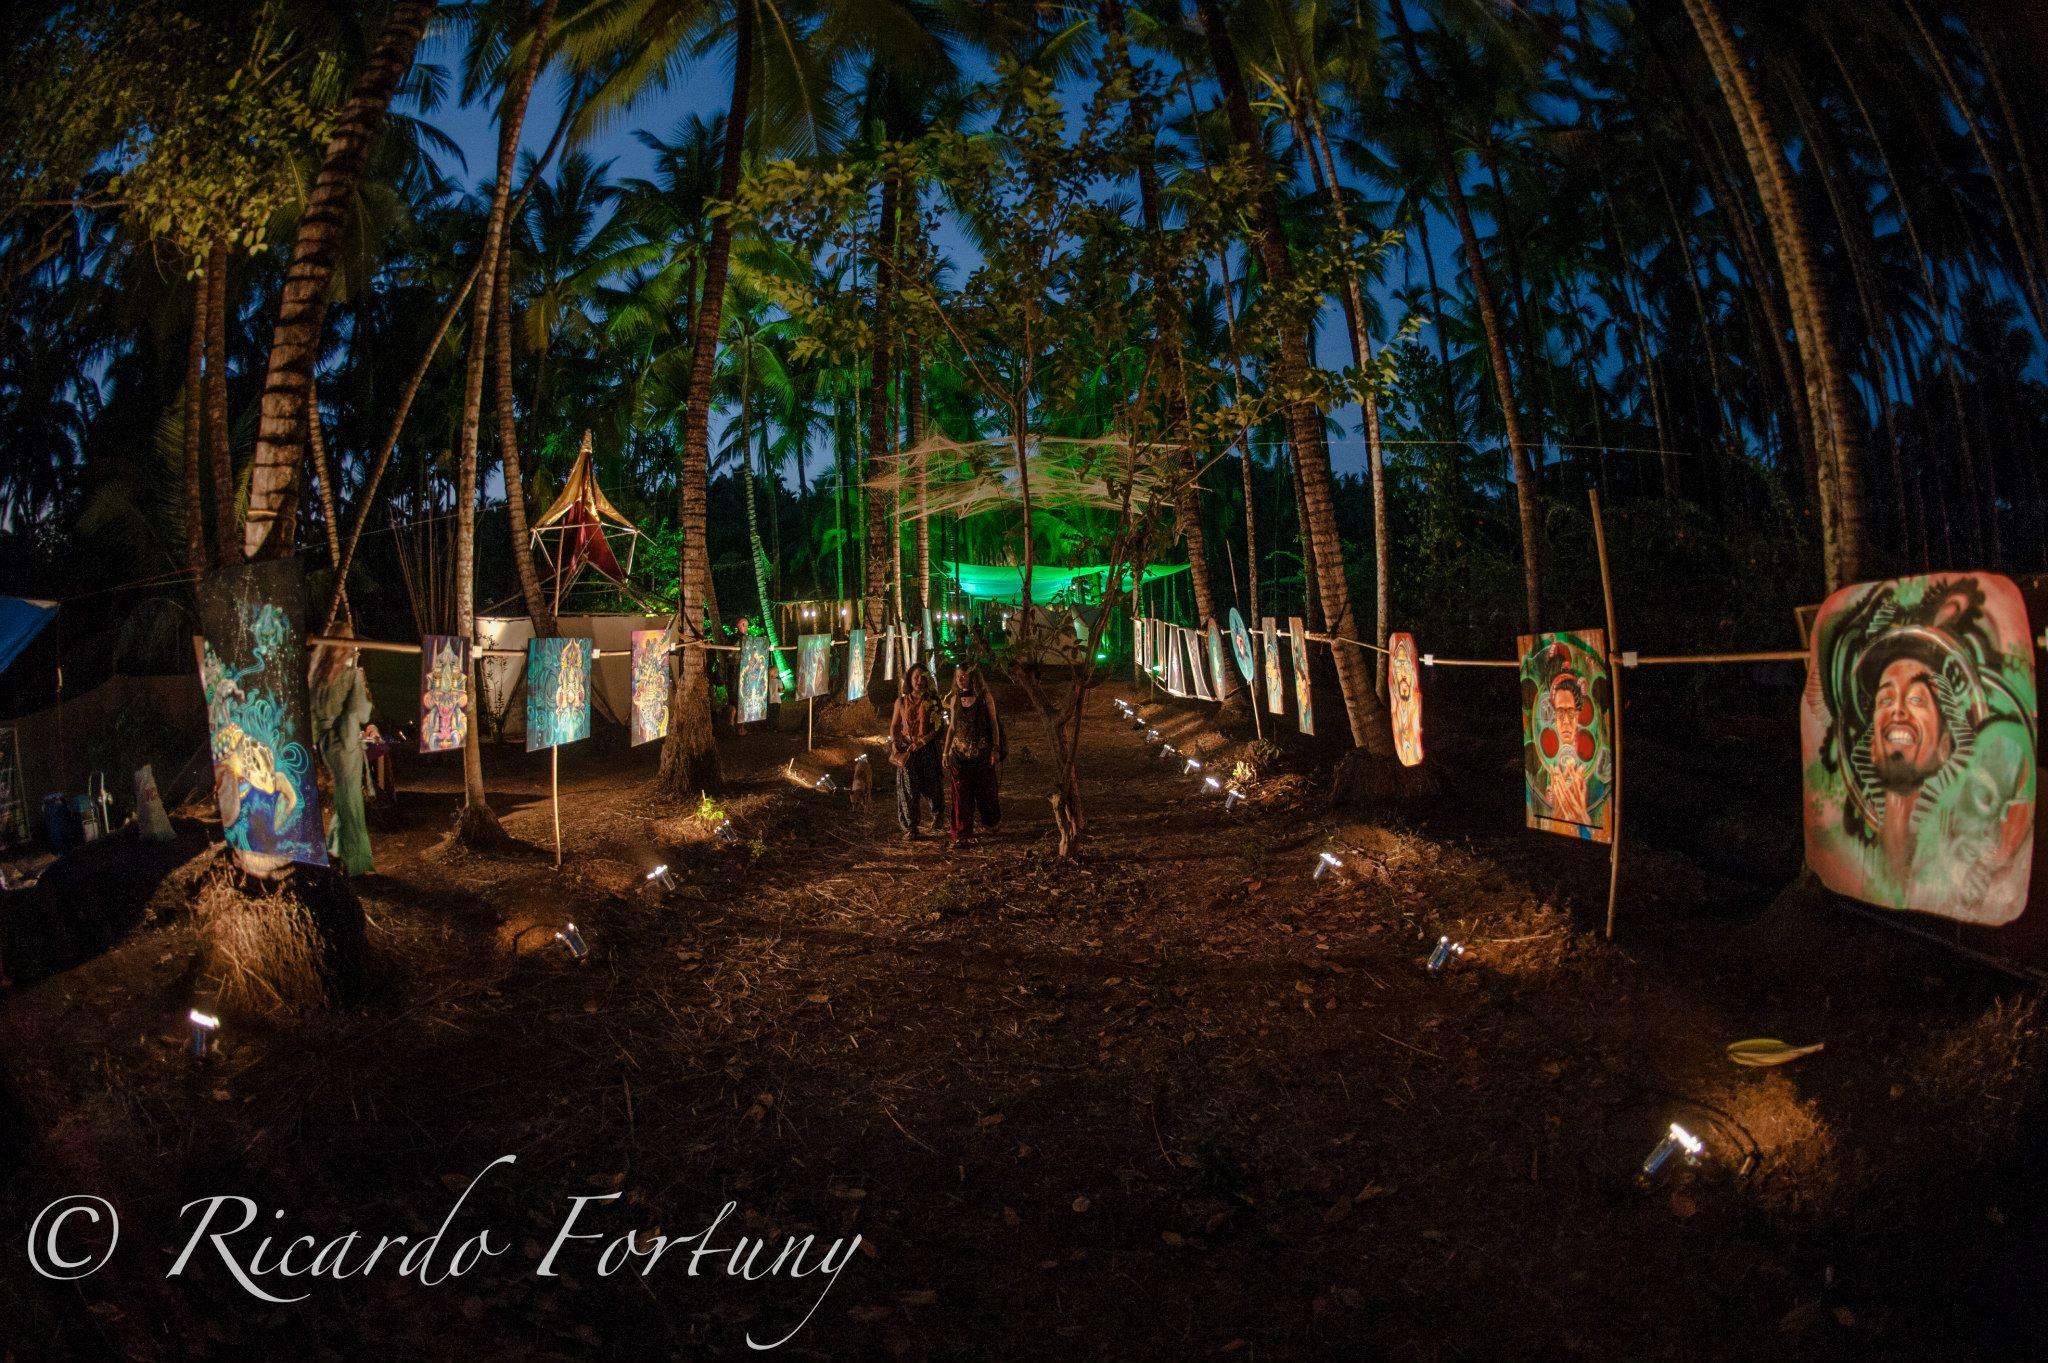 Vasundhara Art Gallery